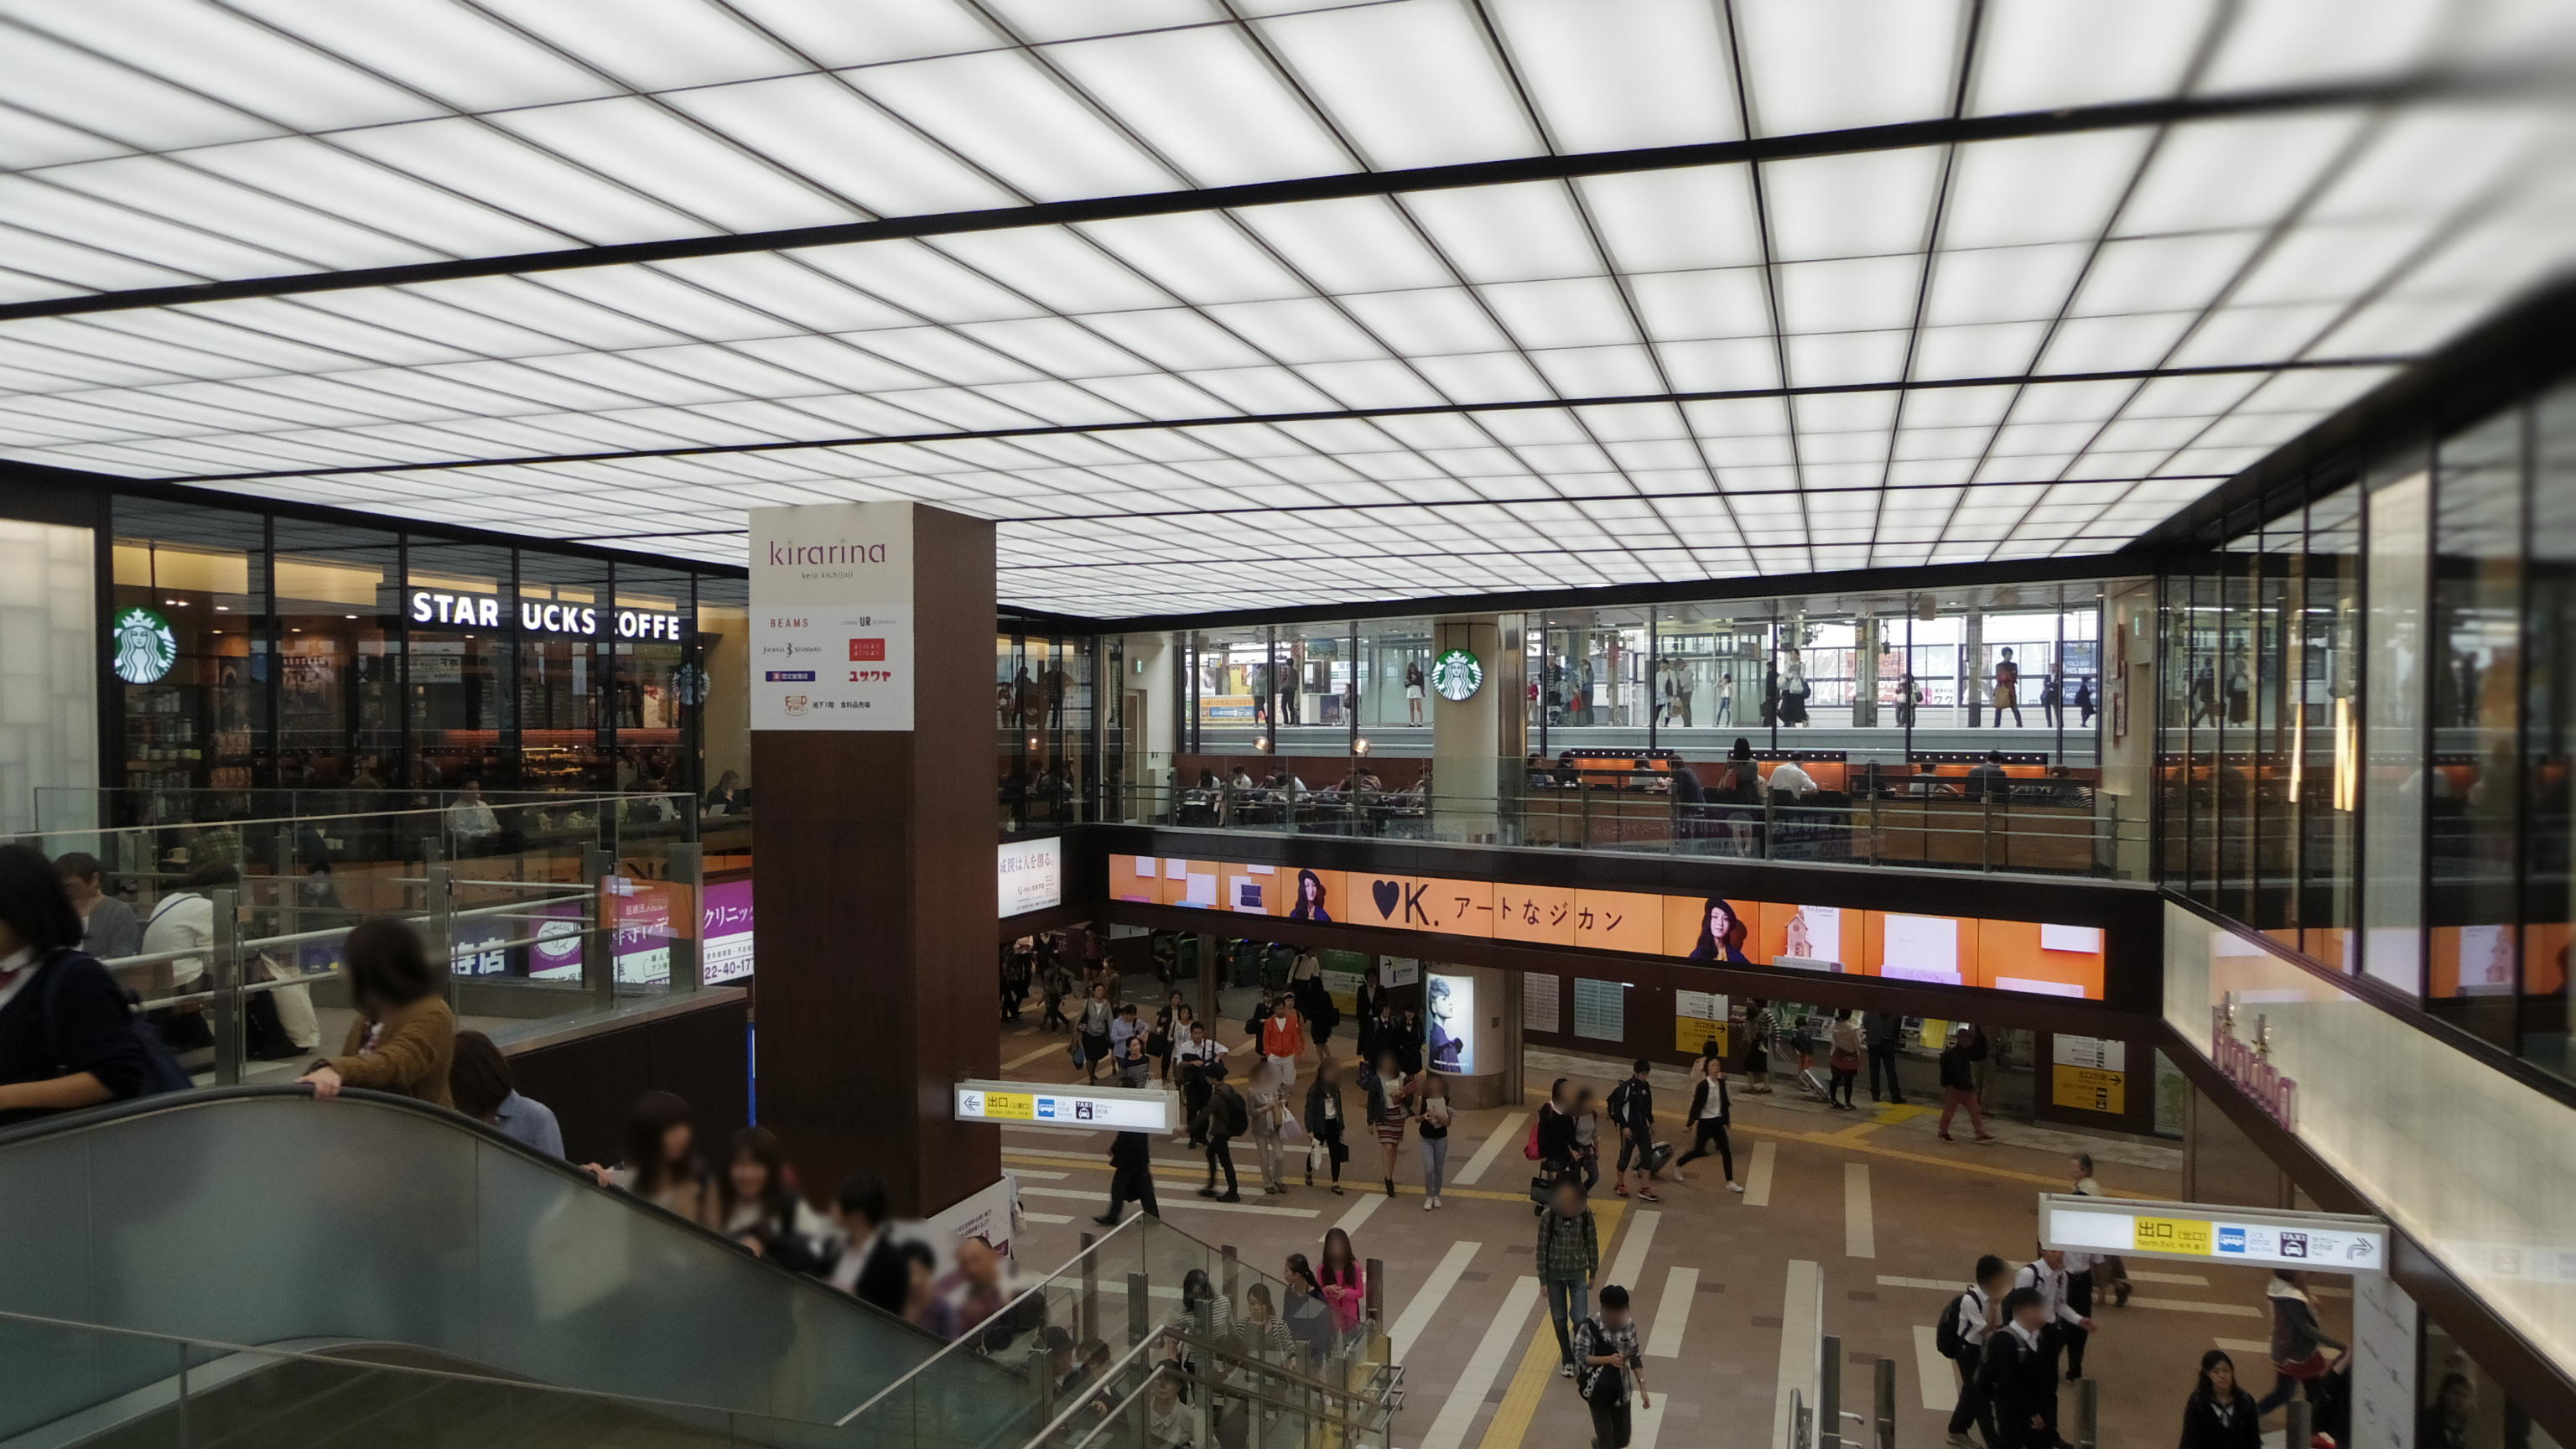 https://upload.wikimedia.org/wikipedia/commons/7/77/Keio_Kichijoji_Station_Escalator.JPG